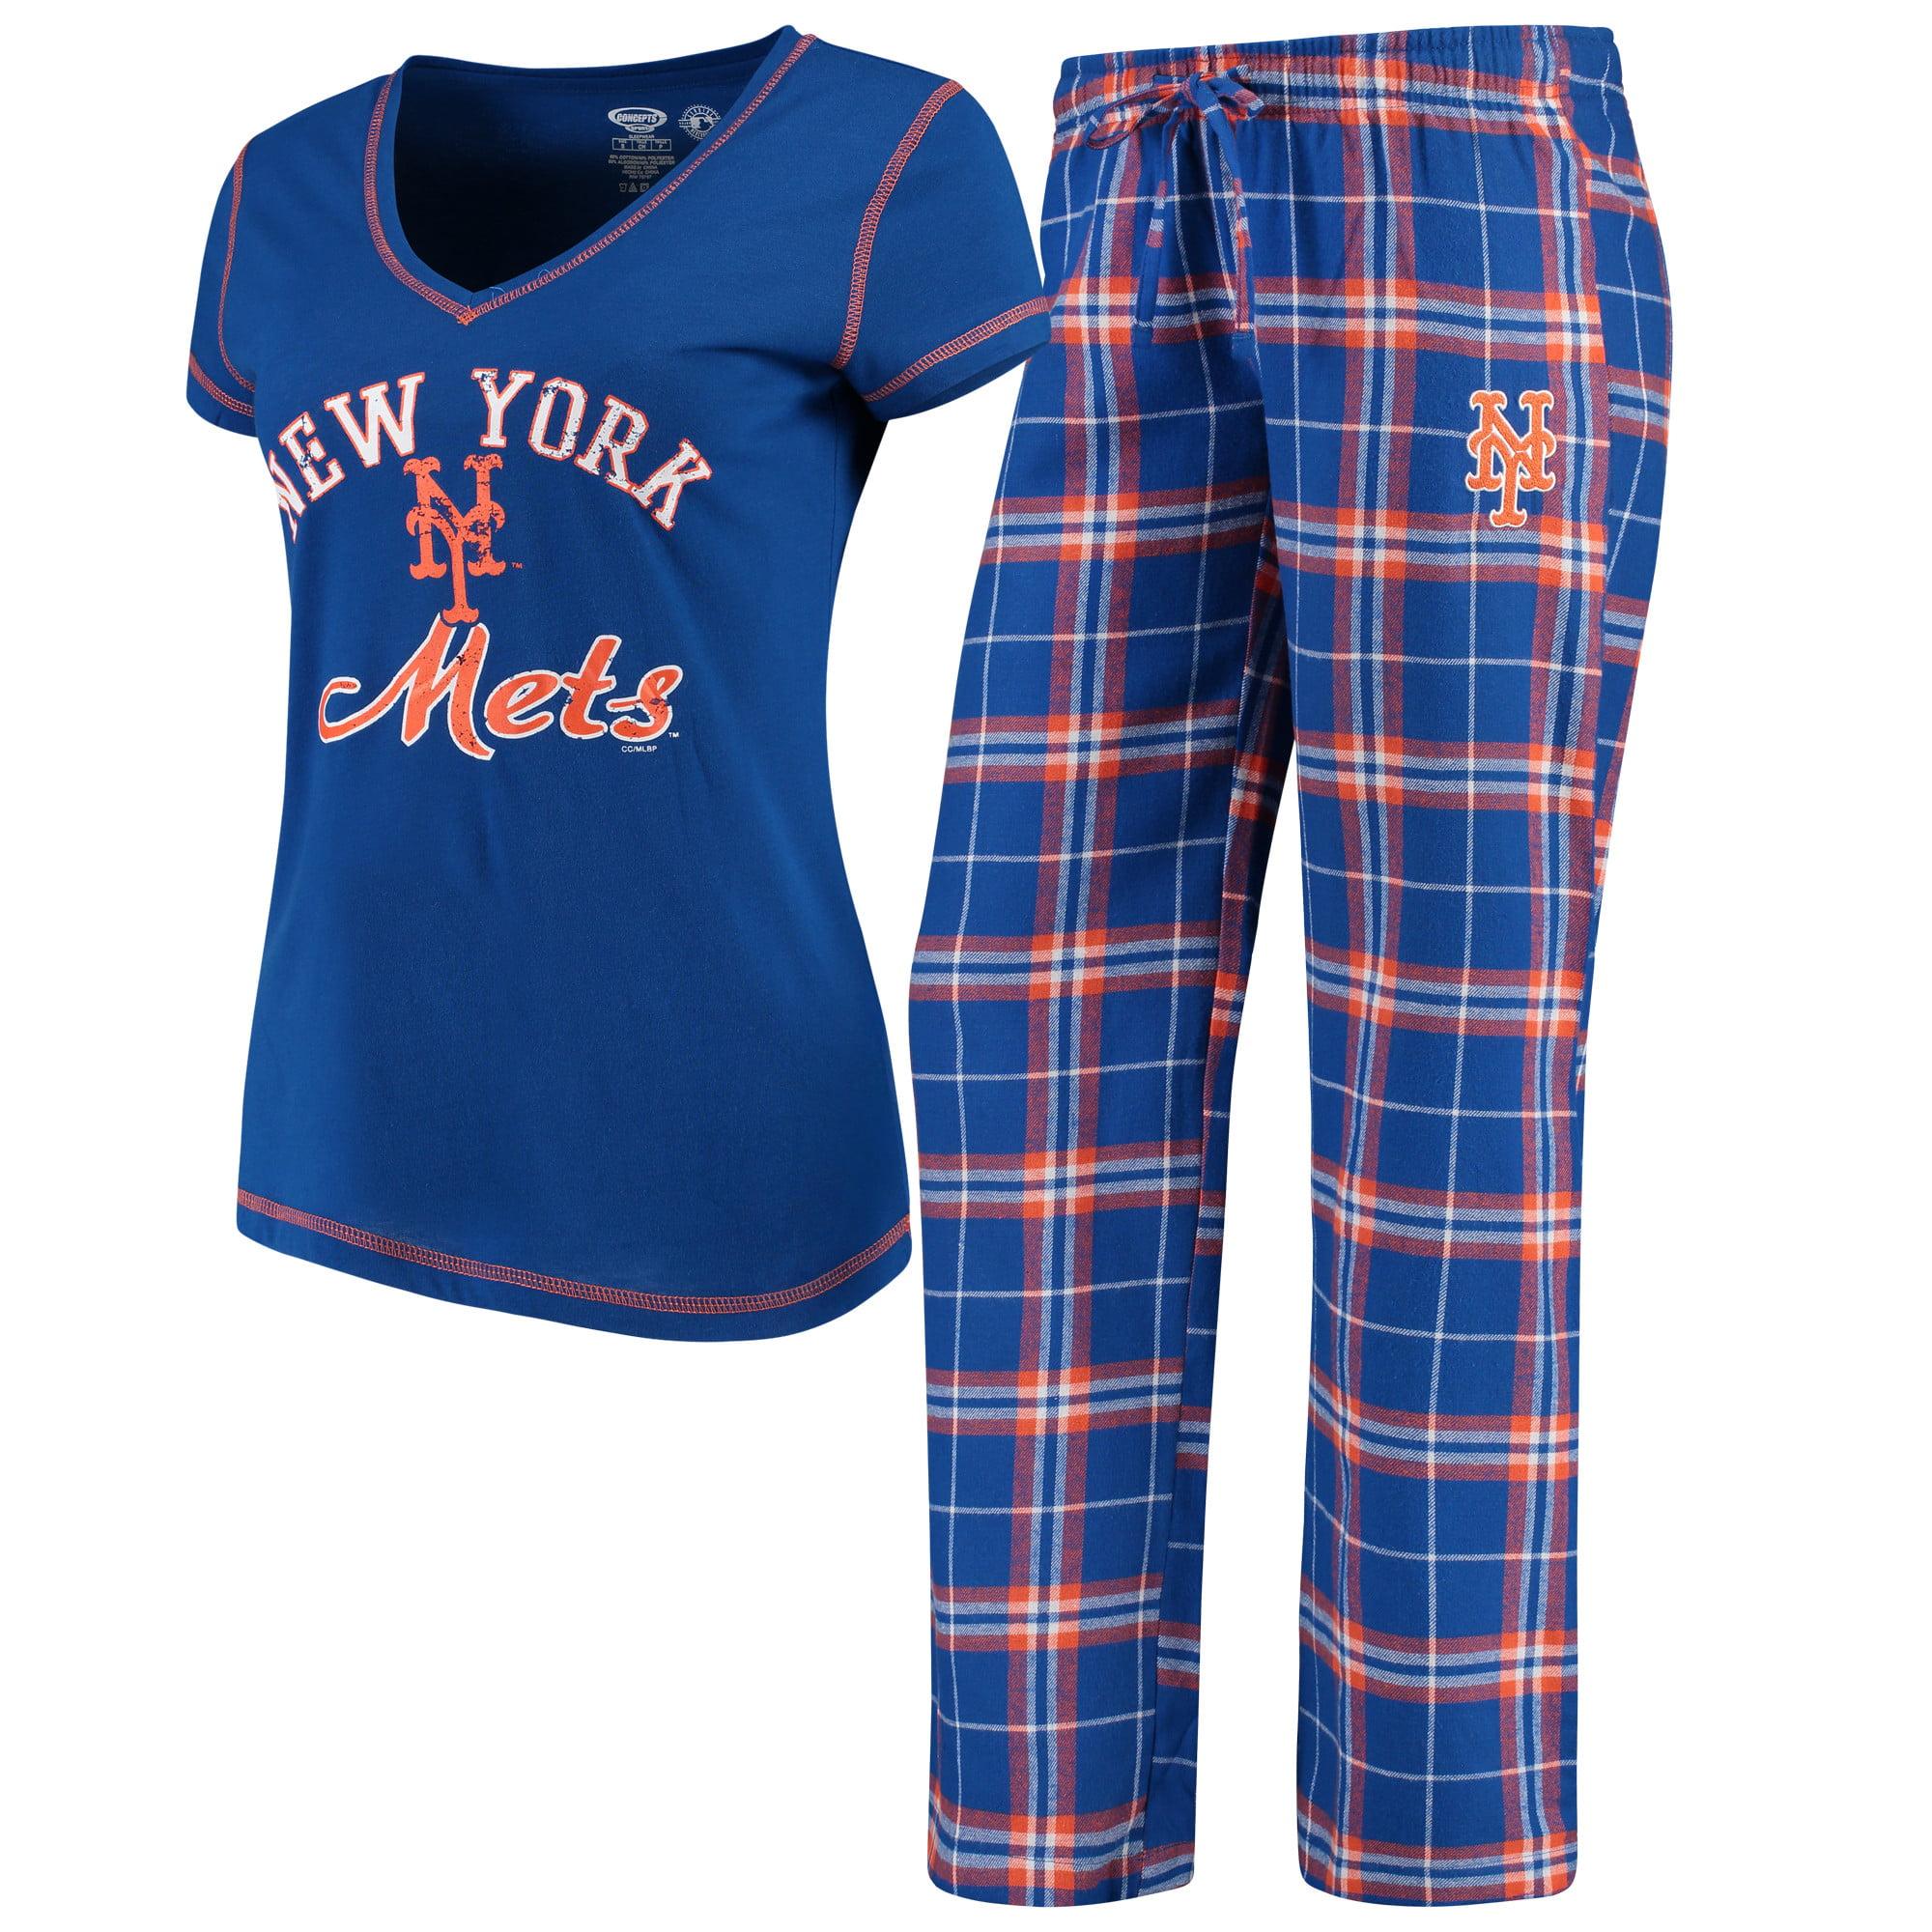 New York Mets Concepts Sport Women's Duo Pants & Top Set - Royal